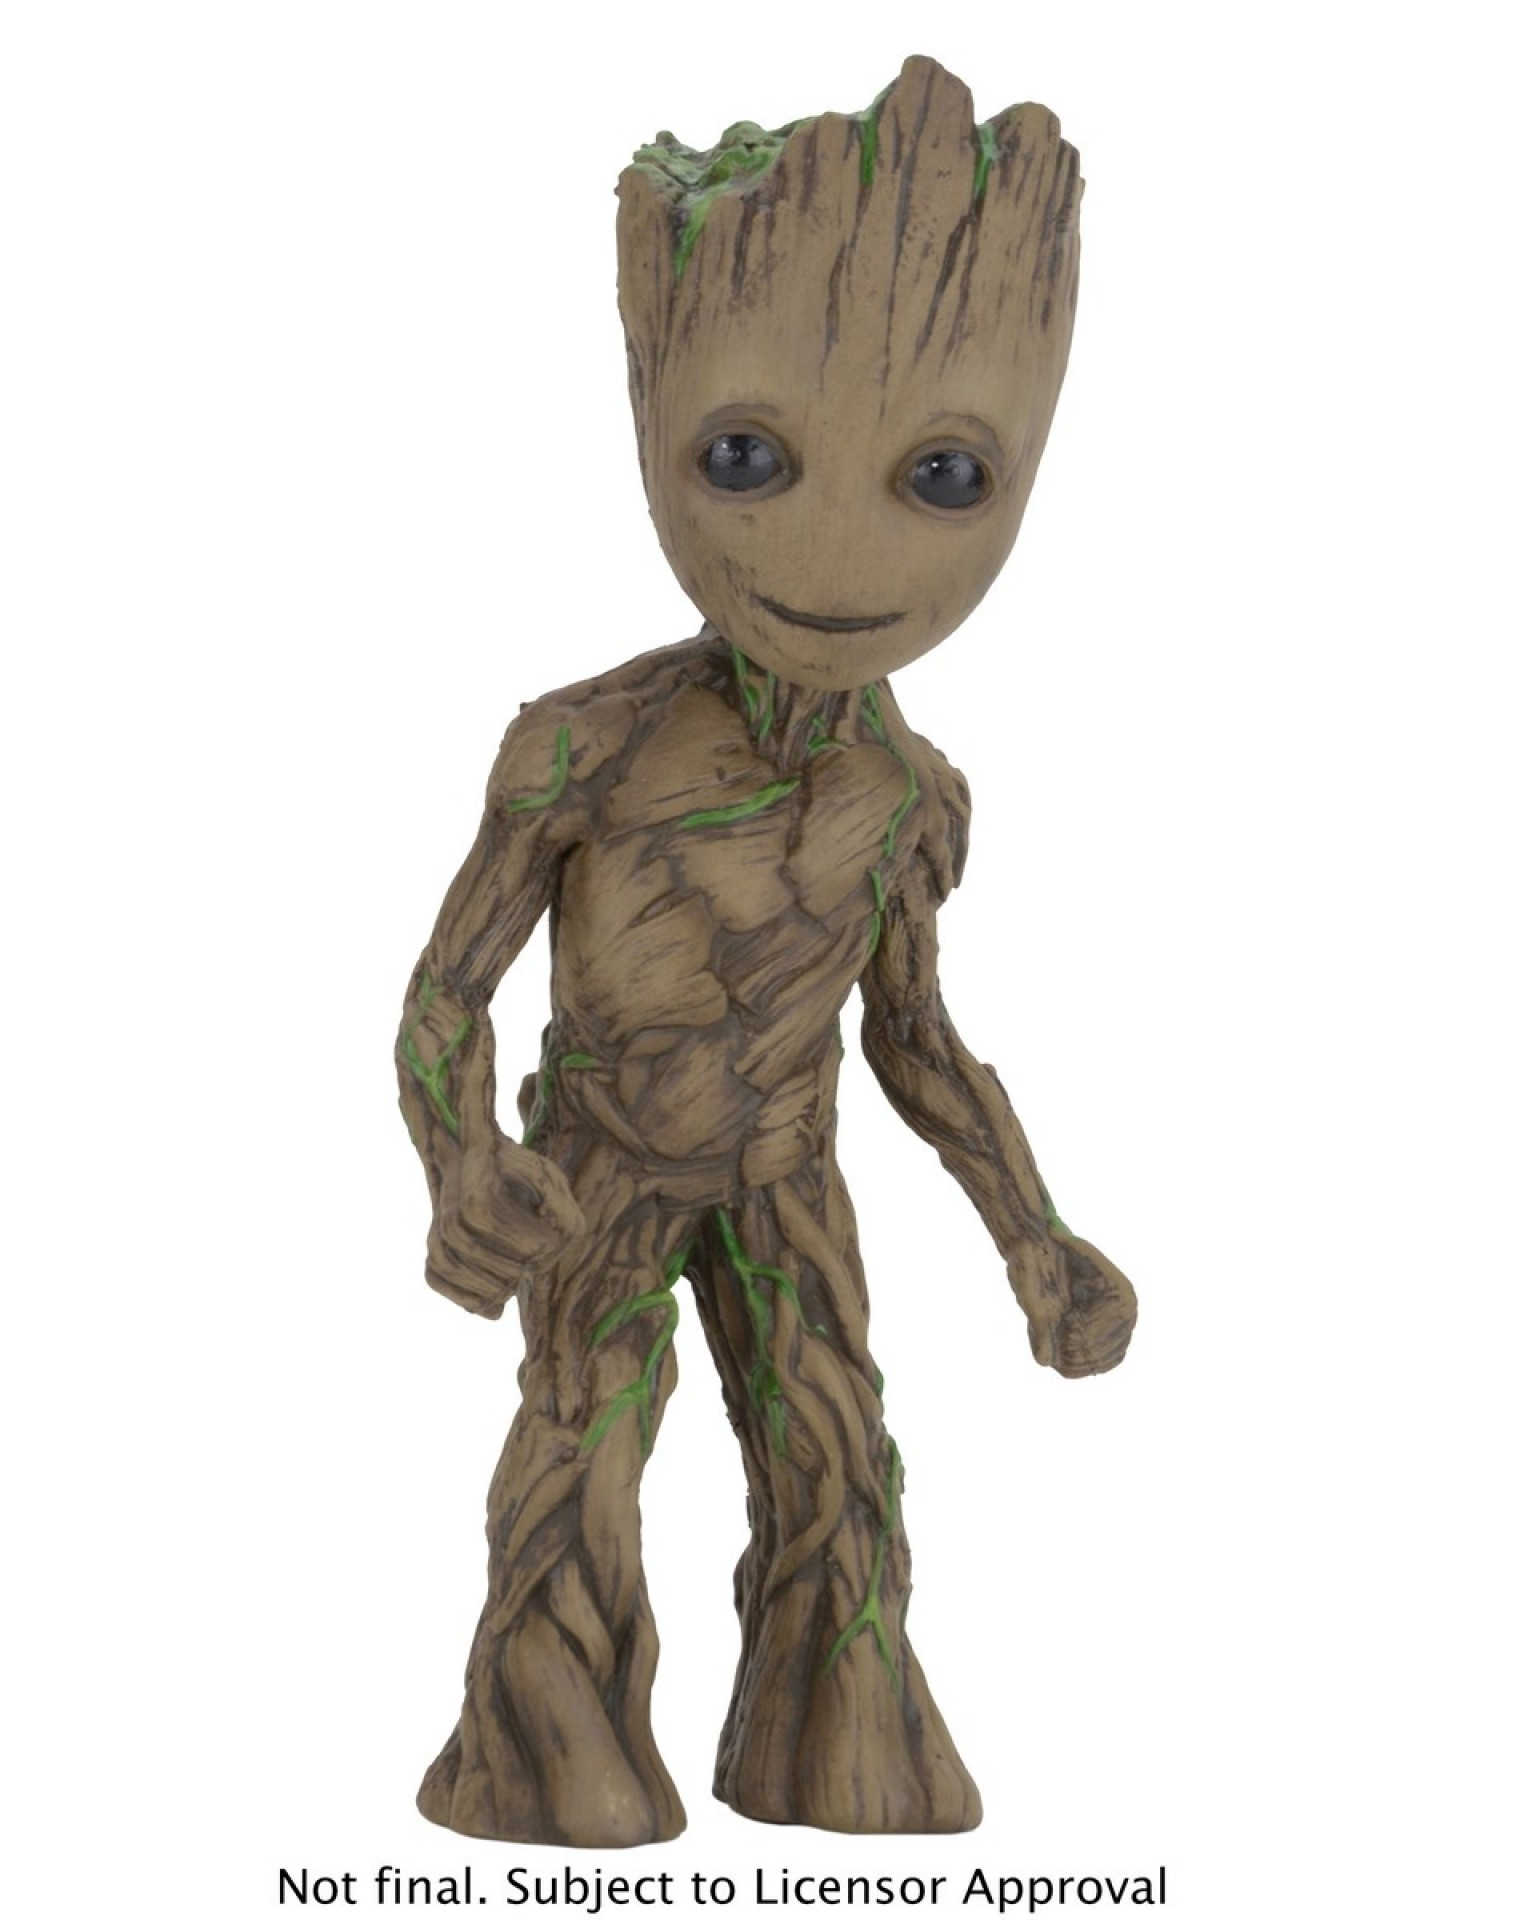 Baby Groot Wallpaper Hd 52 Images